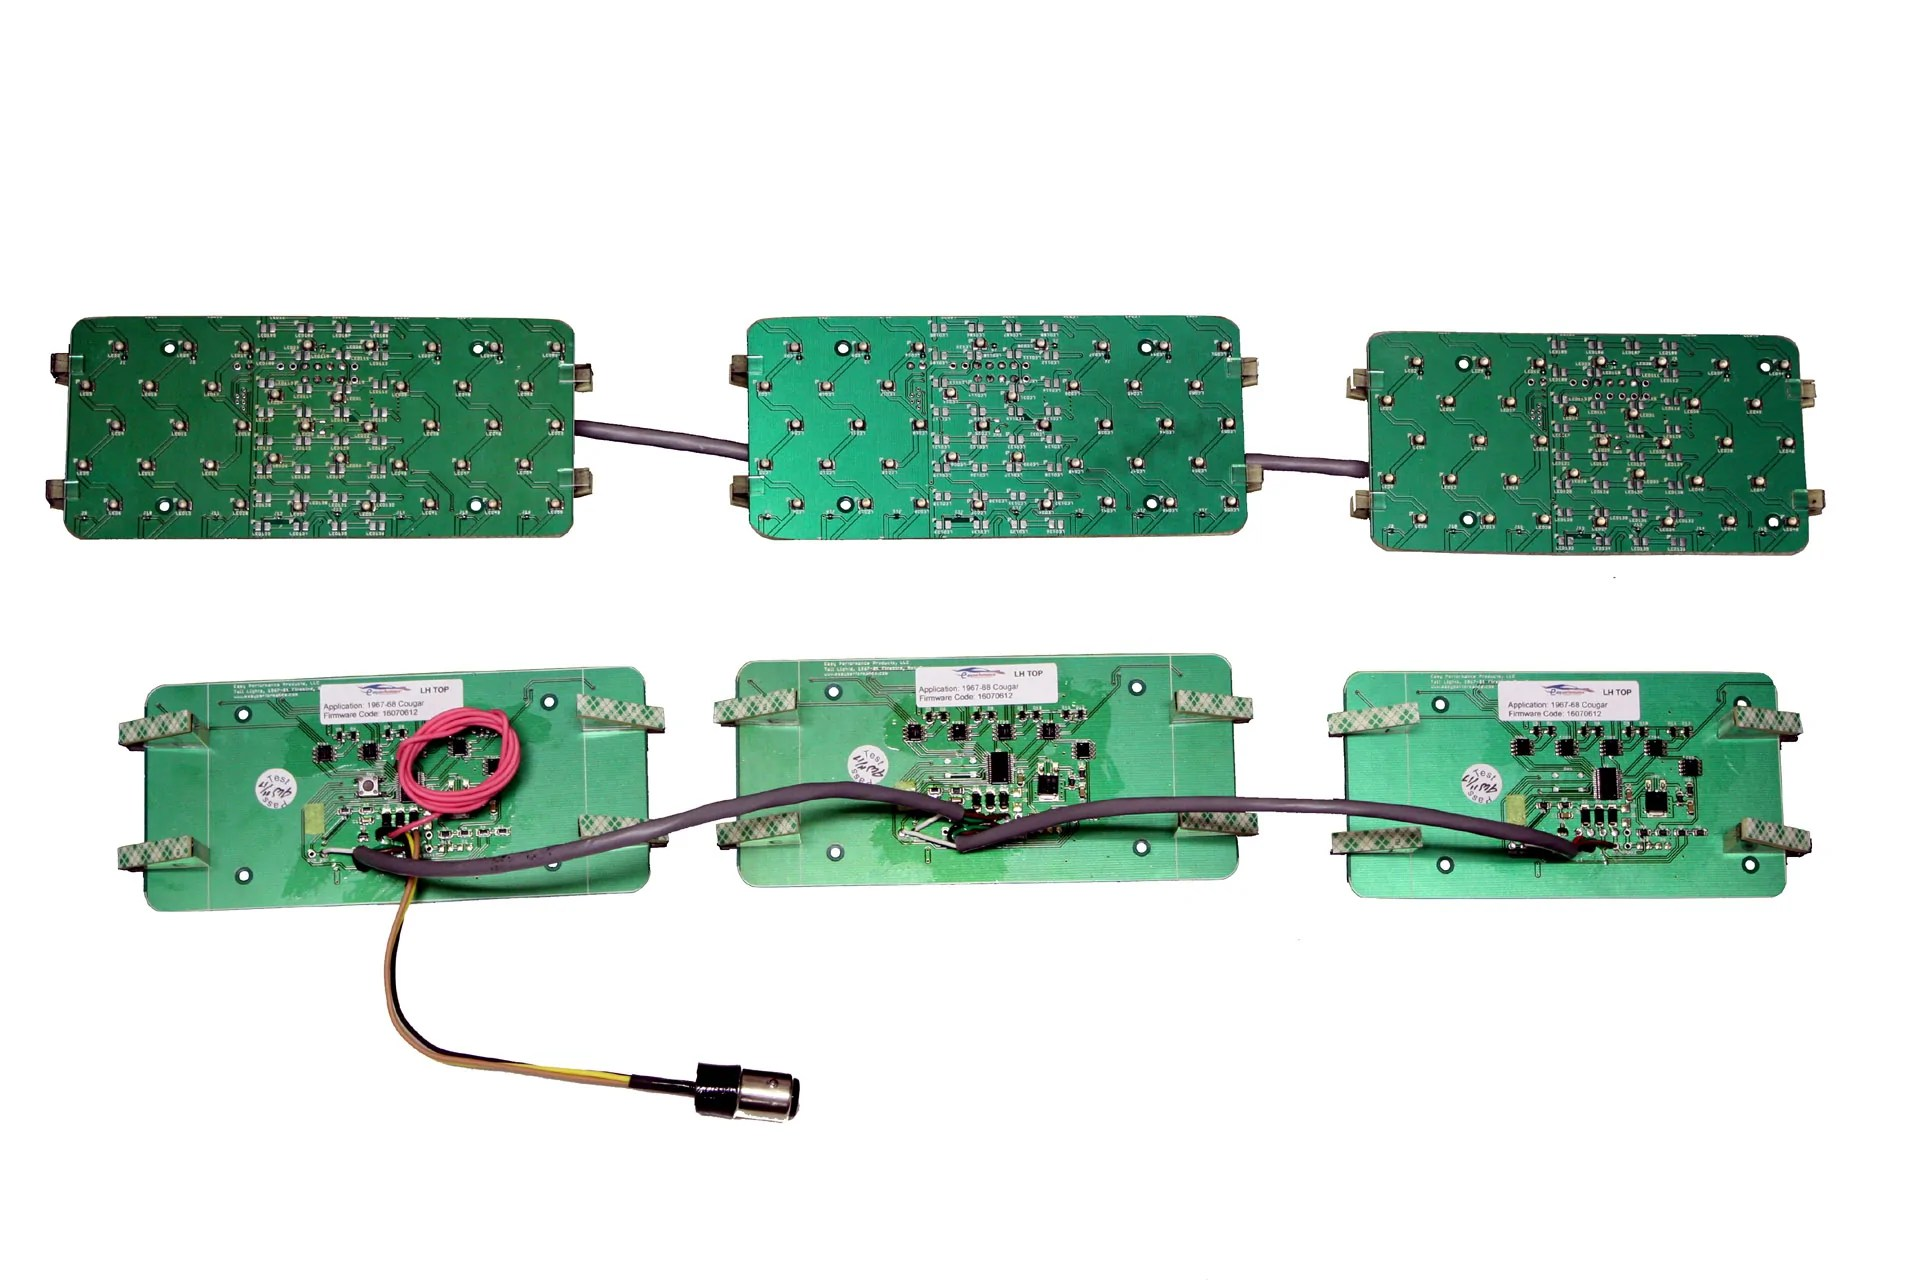 67 cougar fuse box wiring diagram centre 67 cougar wiring diagram [ 1920 x 1280 Pixel ]